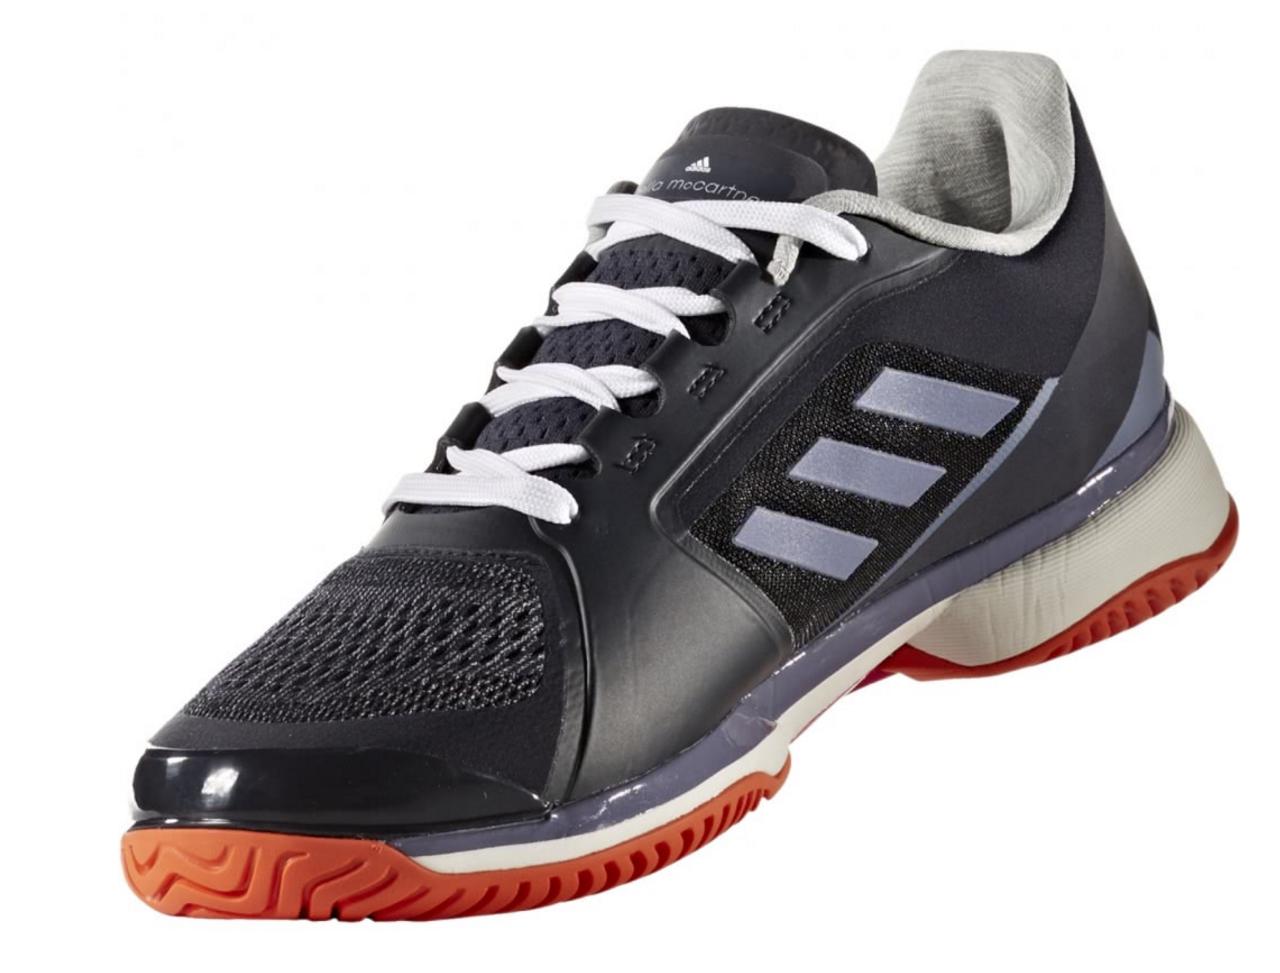 4075be169463 Adidas Barricade Womens SMC Tennis Shoe - Just Rackets